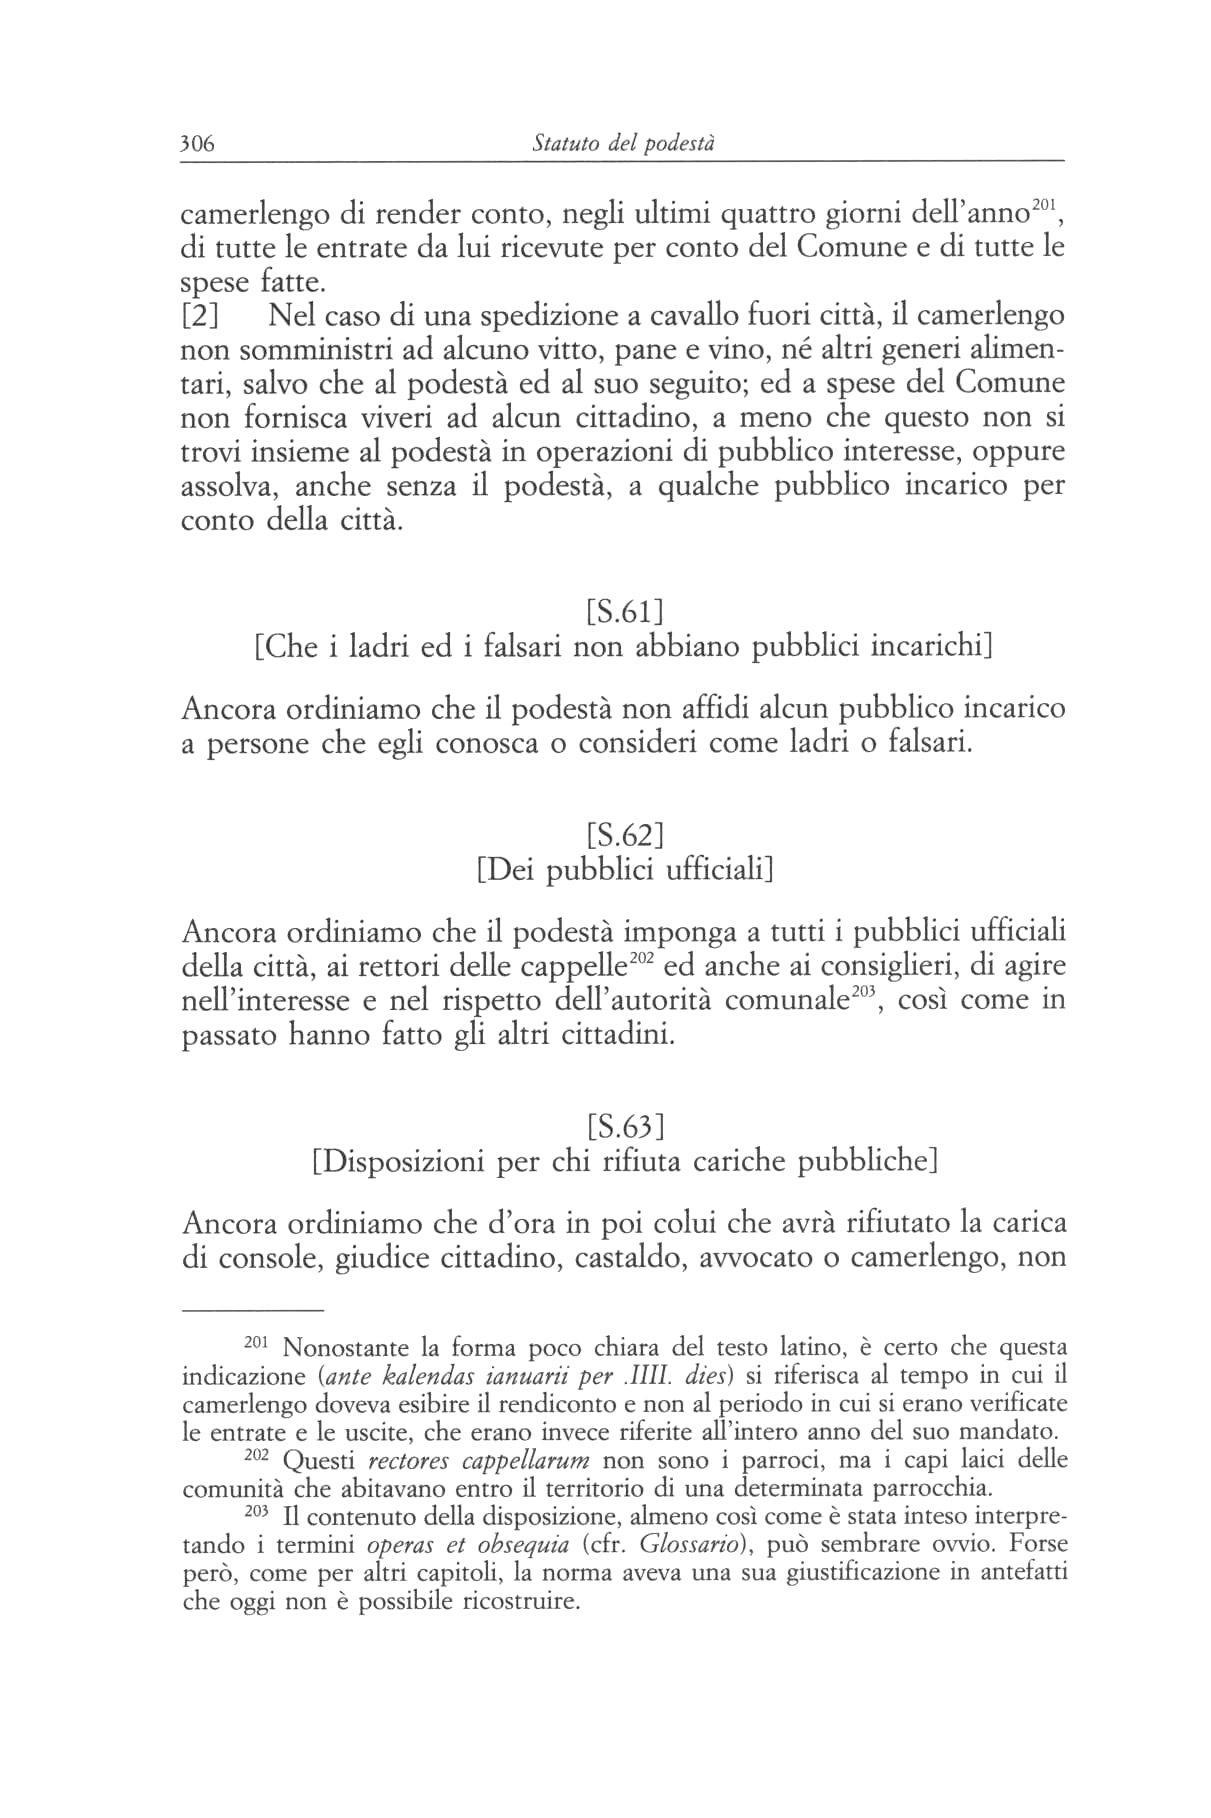 statuti pistoiesi del sec.XII 0306.jpg